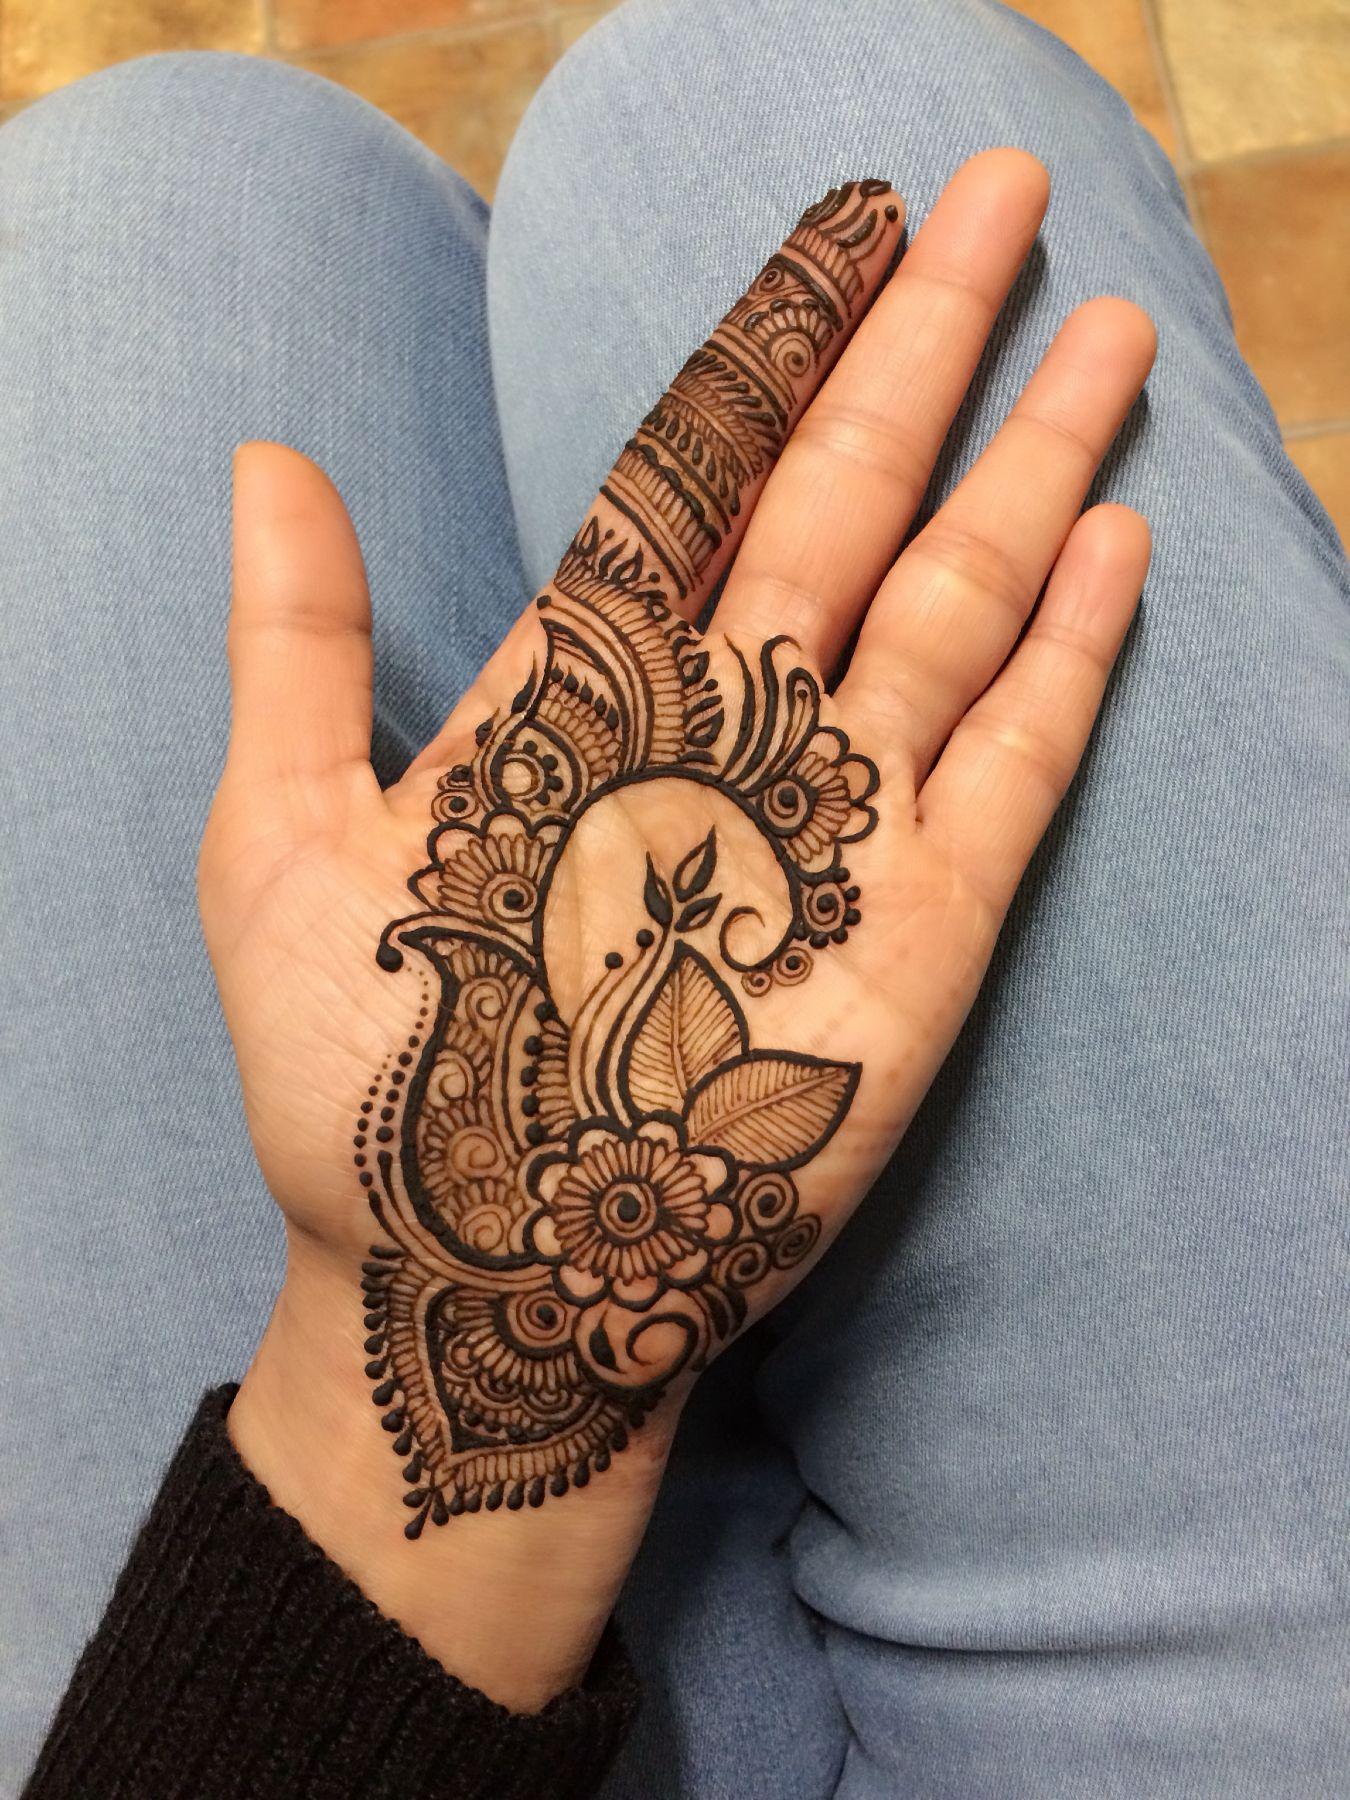 Mehndi Hand Designs For Kids